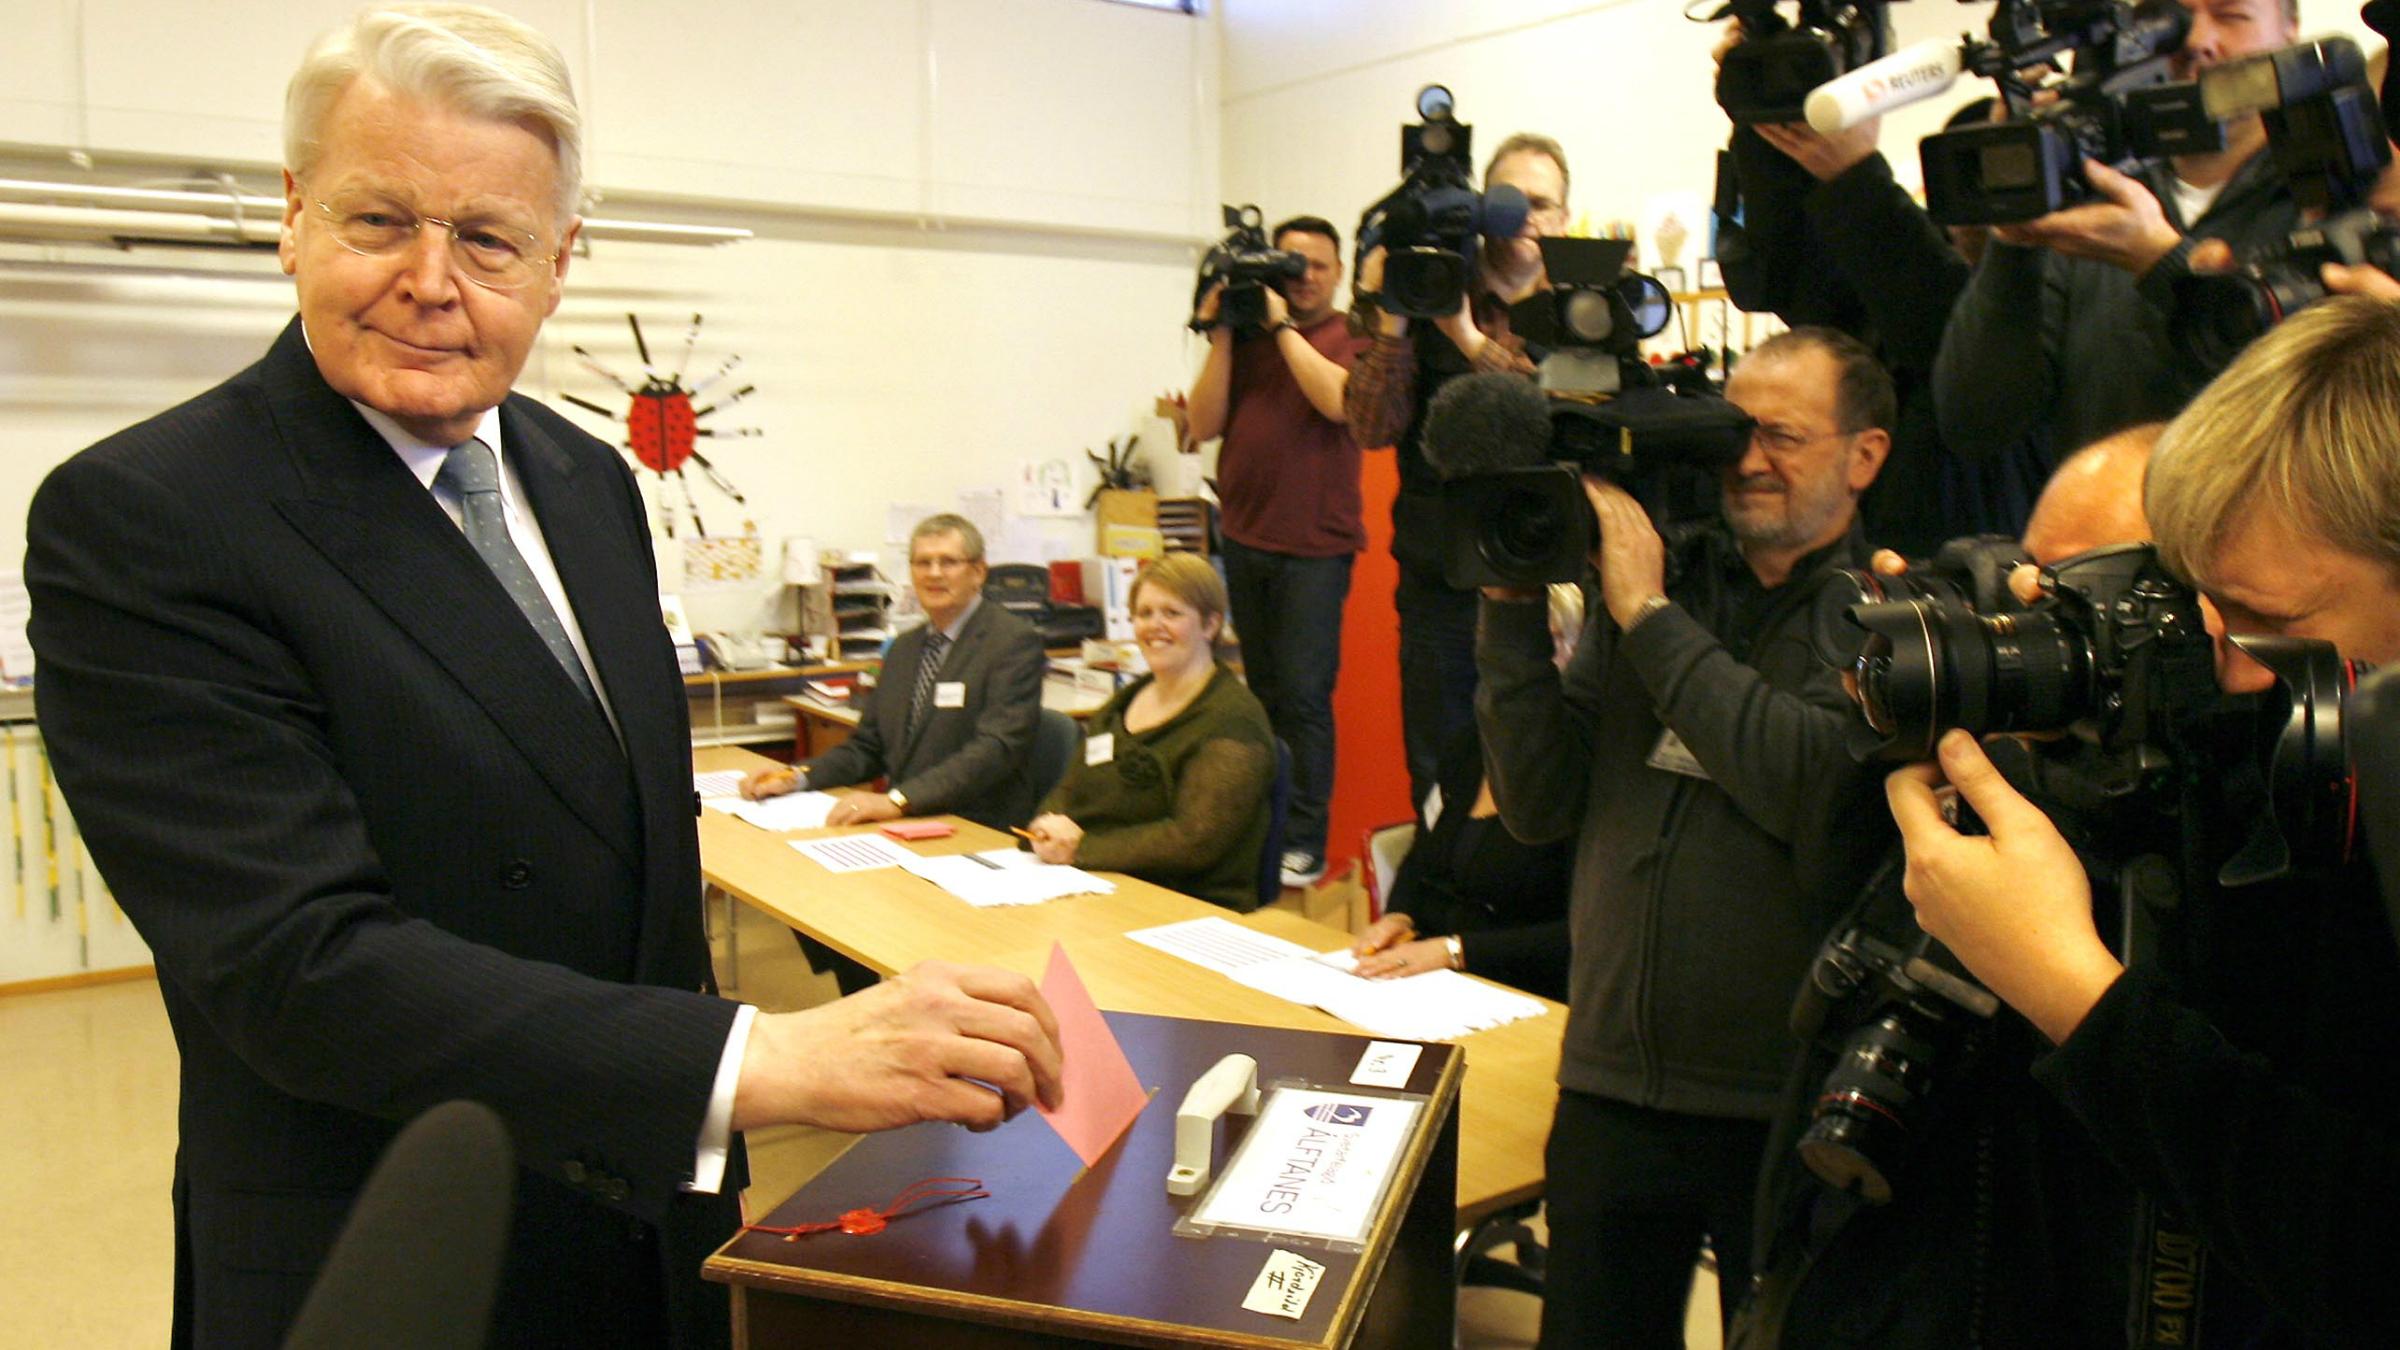 iceland president democracy european union